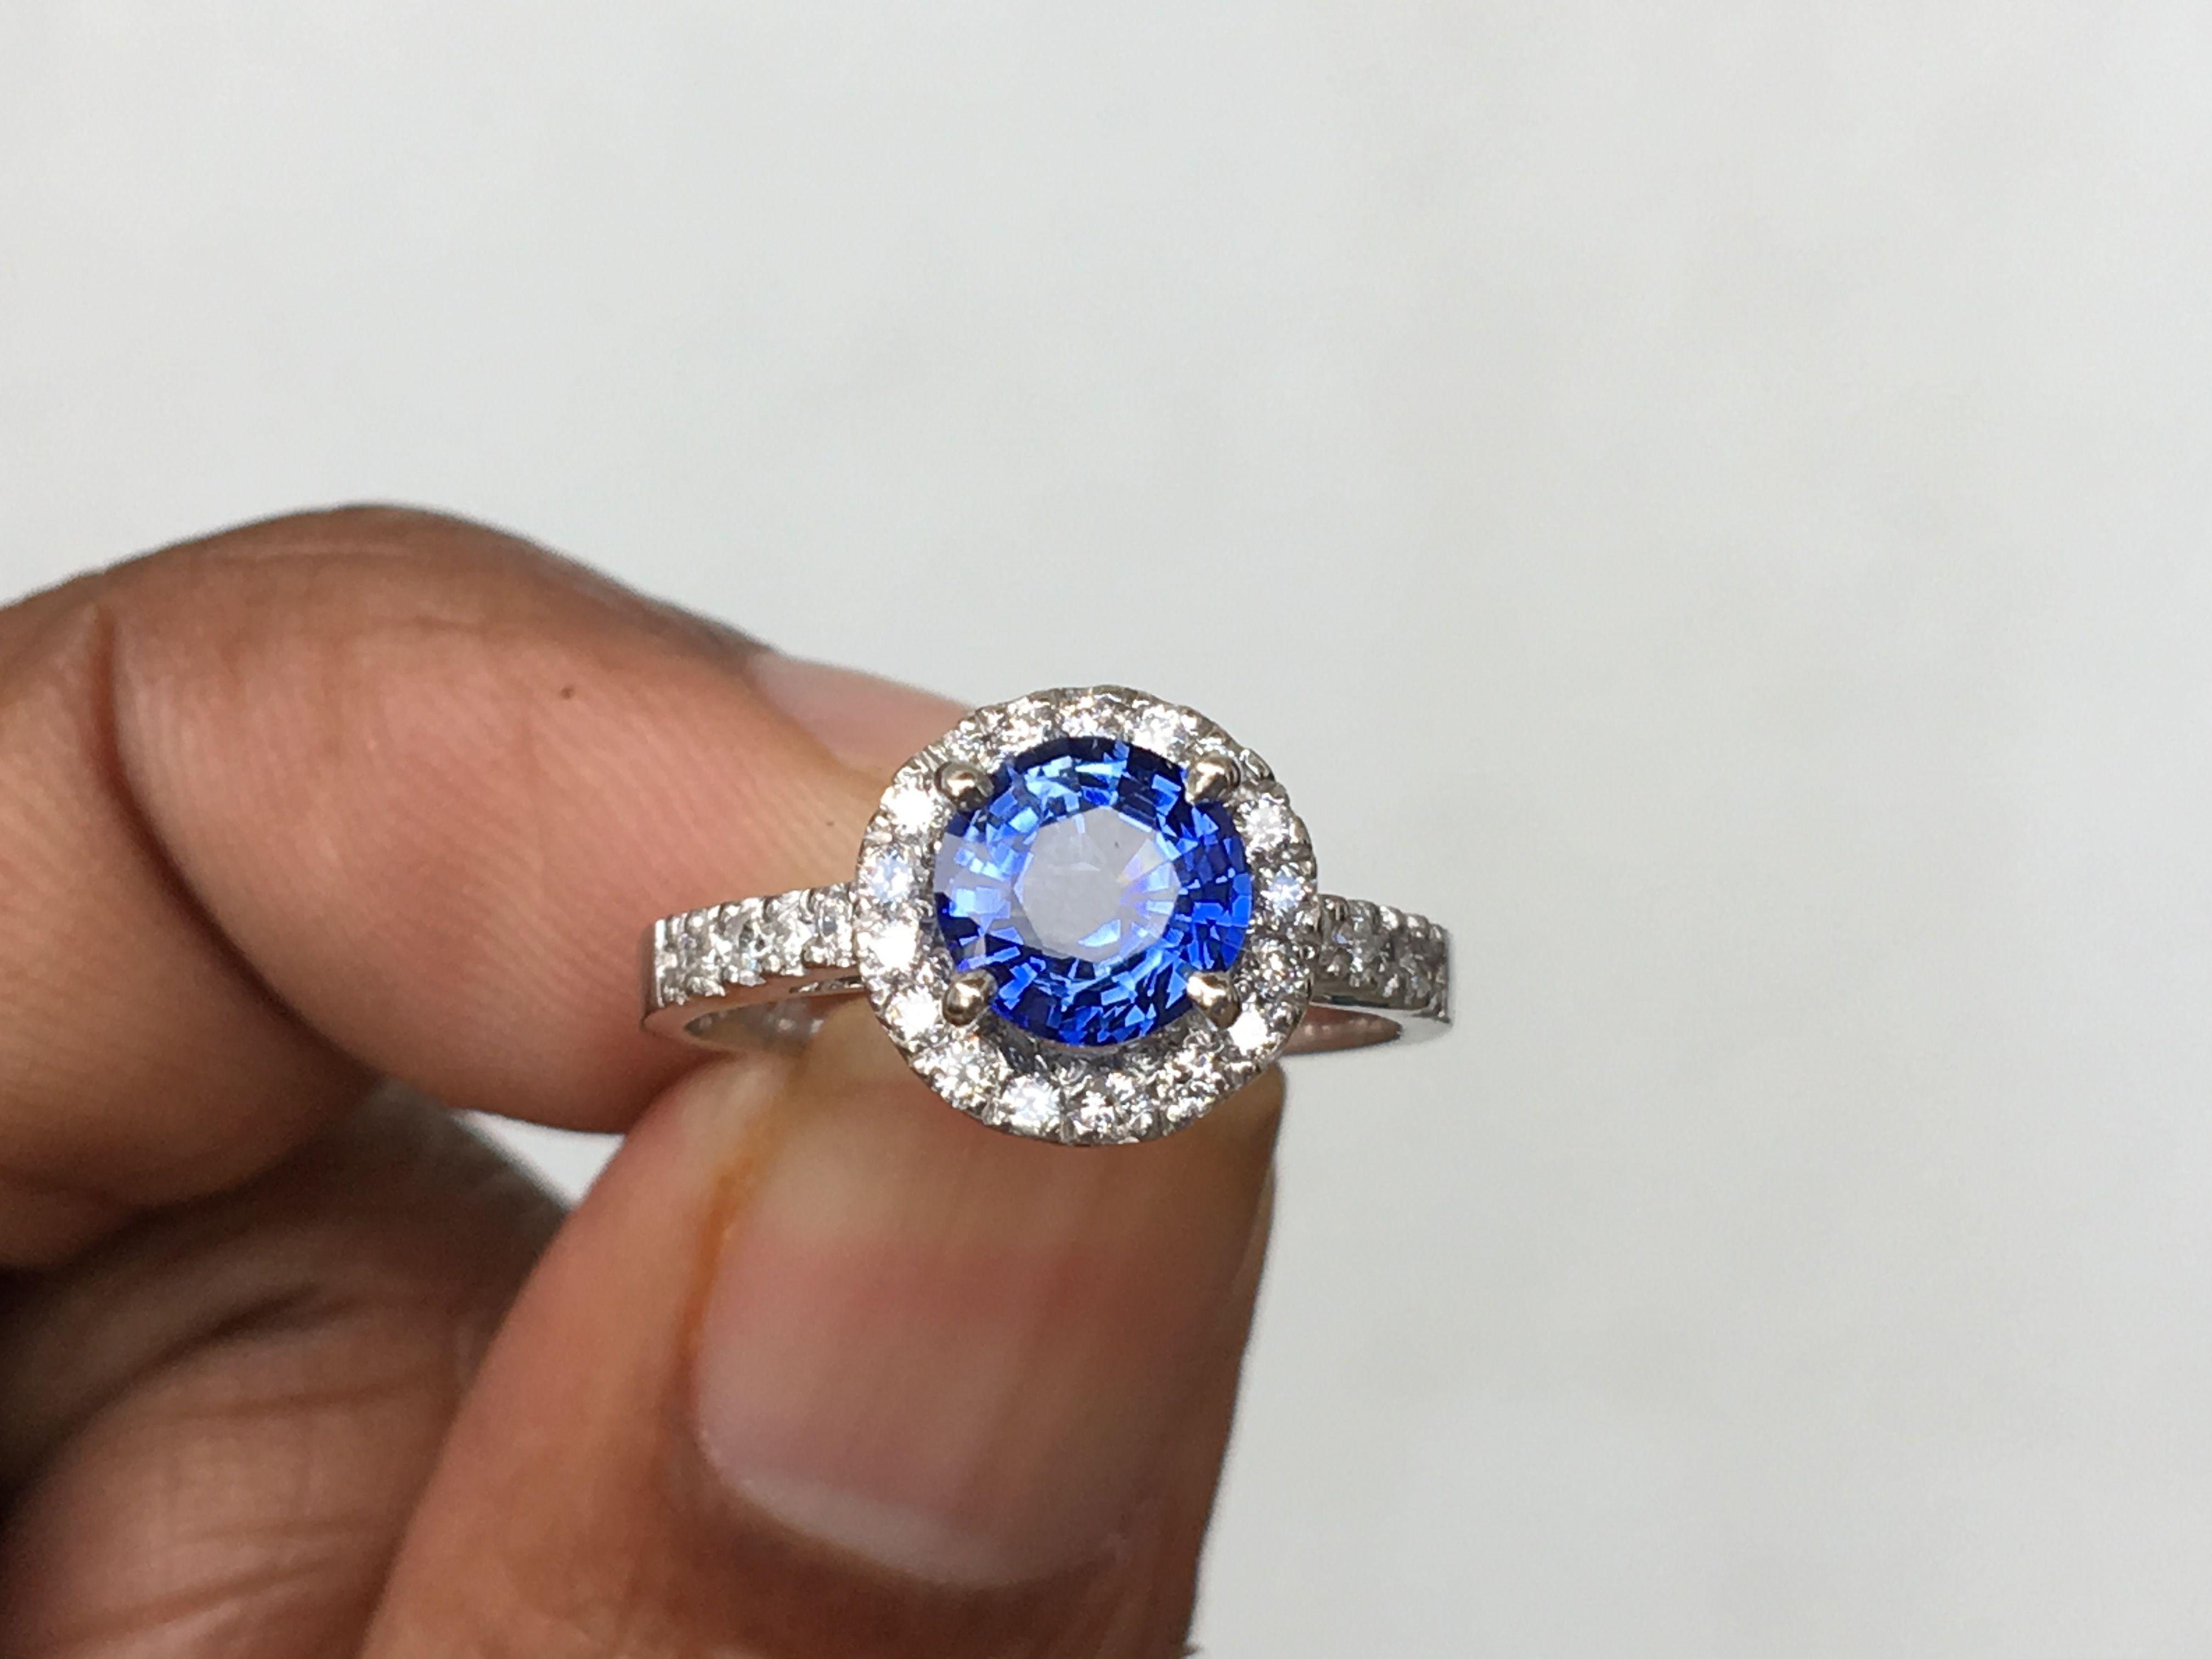 Ceylon Blue Sapphire Halo Engagement Ring1 2 Carat Round Blue Etsy Blue Sapphire Engagement Ring Halo Sapphire Engagement Ring Blue Blue Sapphire Halo